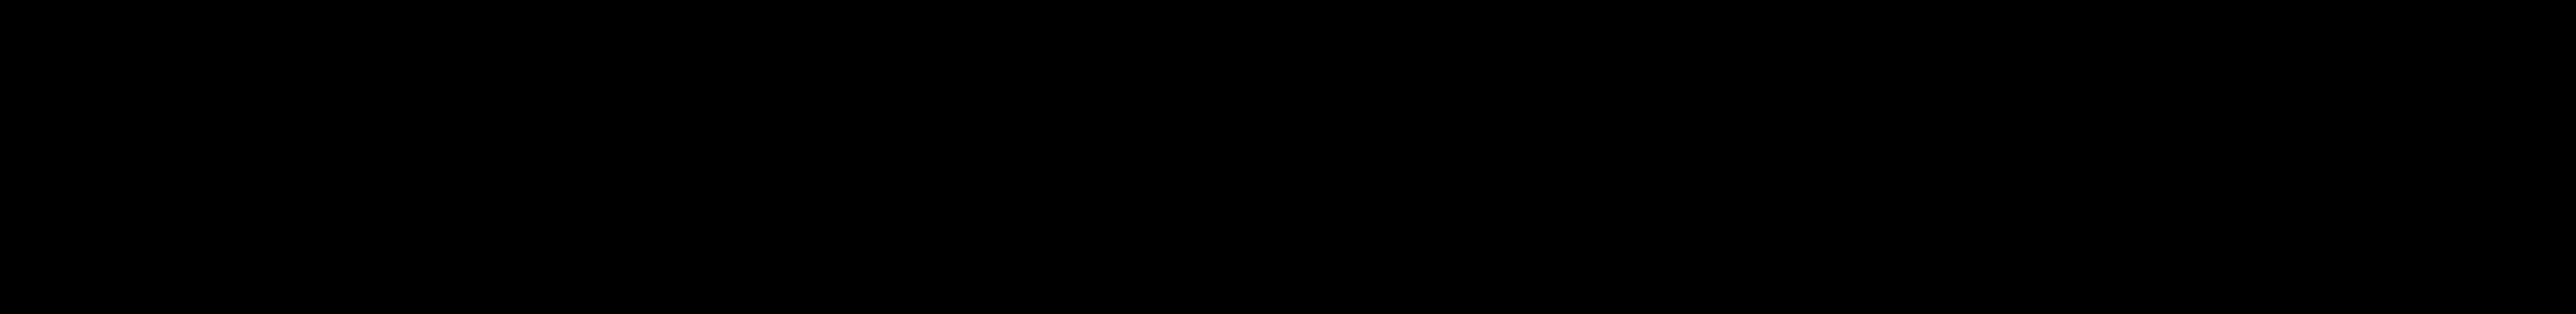 Bananacode logo